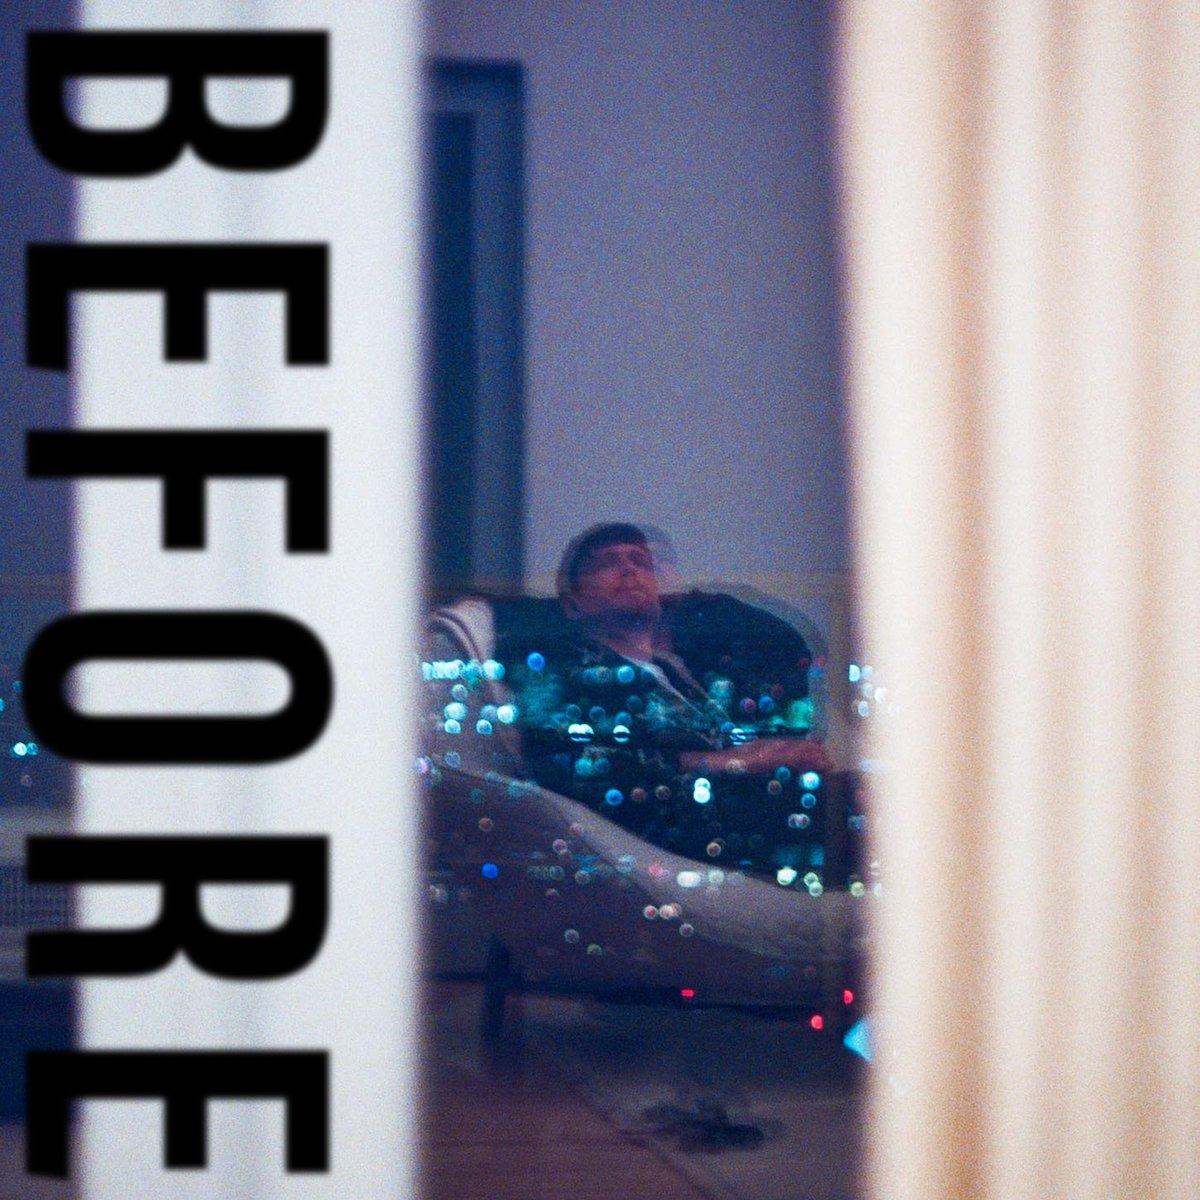 james blake before EP album cover artwork